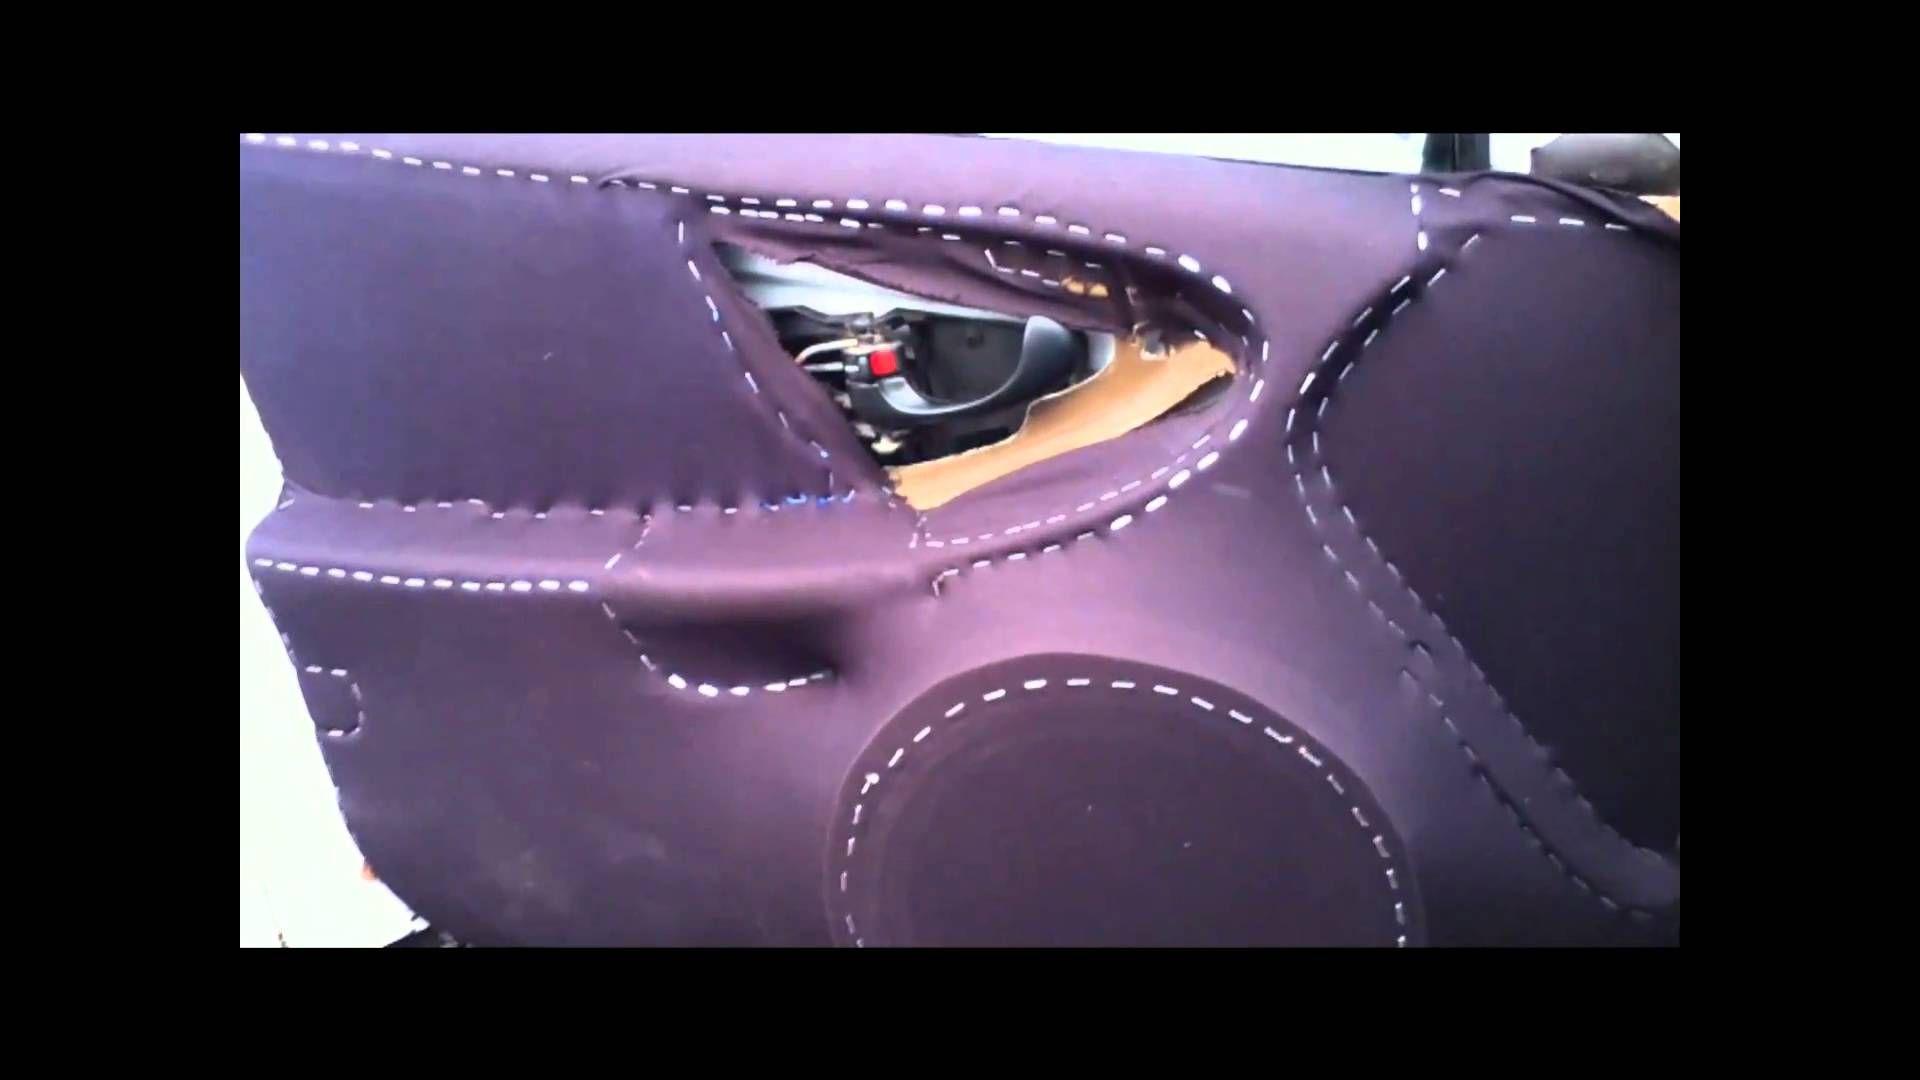 Fiberglass Door Panels 1 Fiberglass Door Car Stereo Diy Car Interior Design